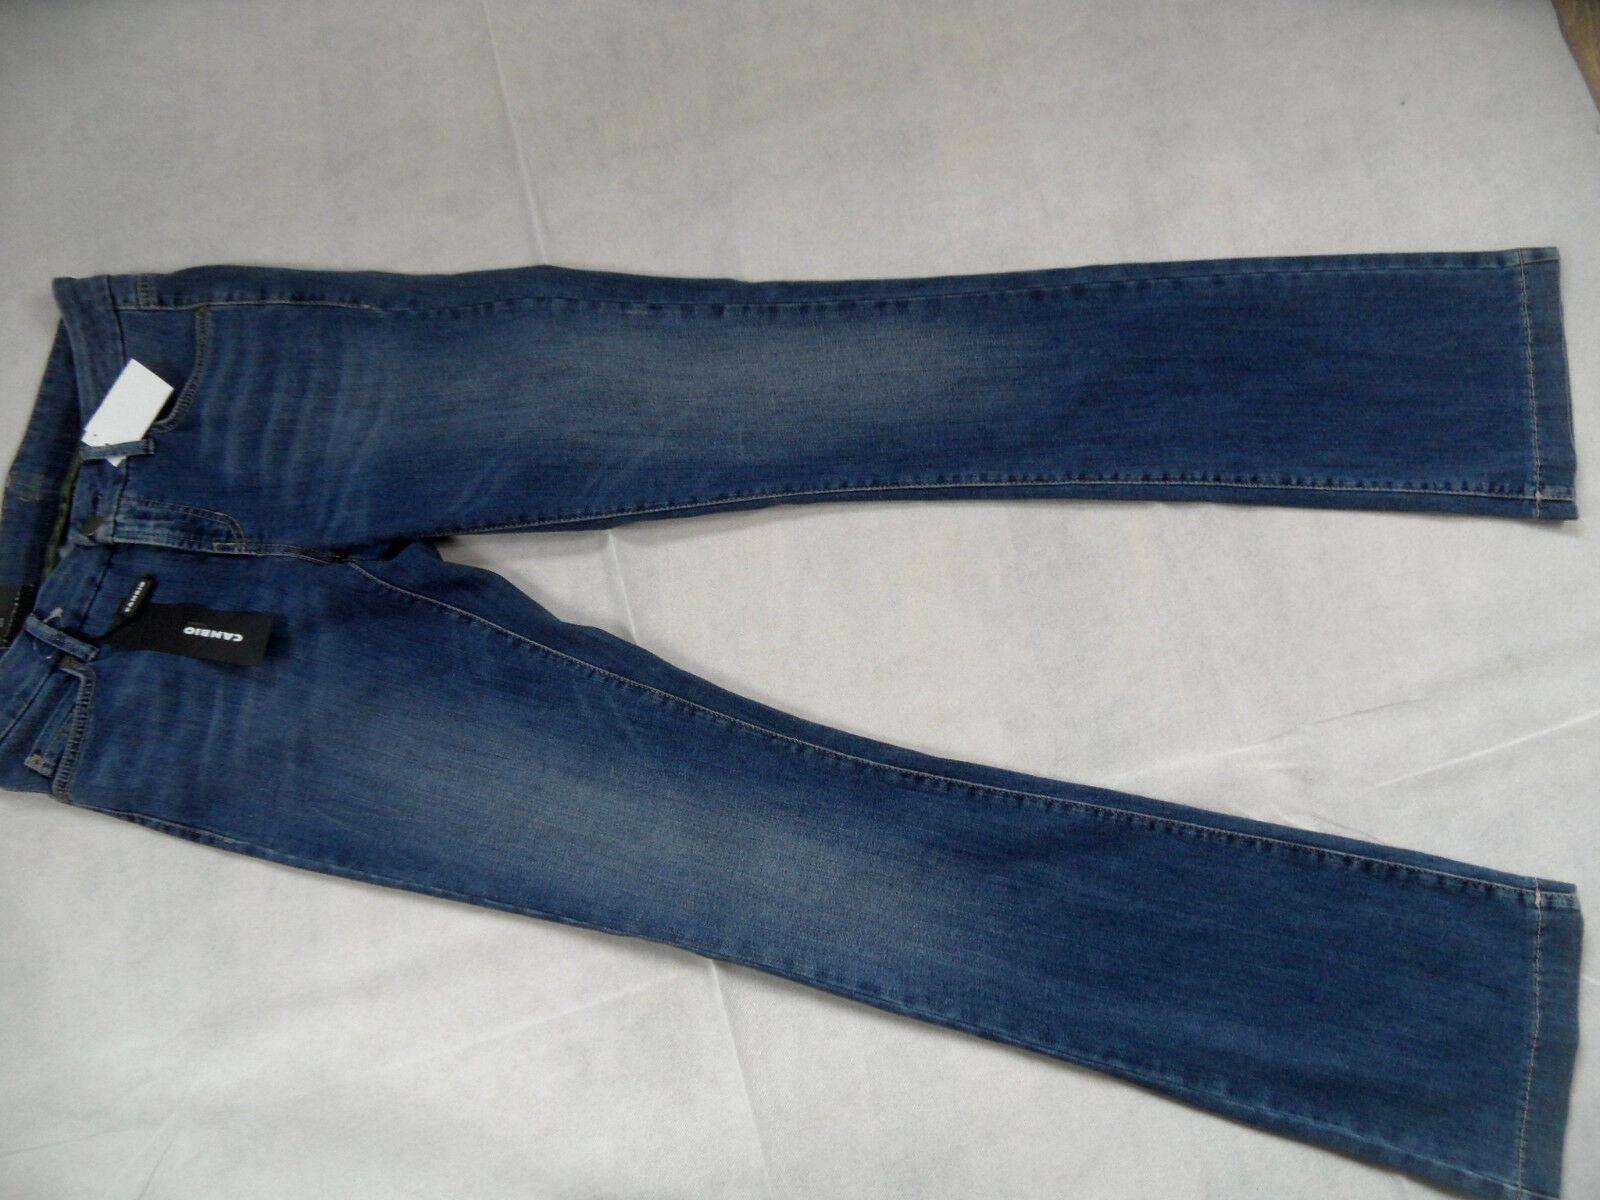 CAMBIO tolle Stiefelcut Jeans LOLA easy kick modern rise powder-soft Gr. 36 NEU